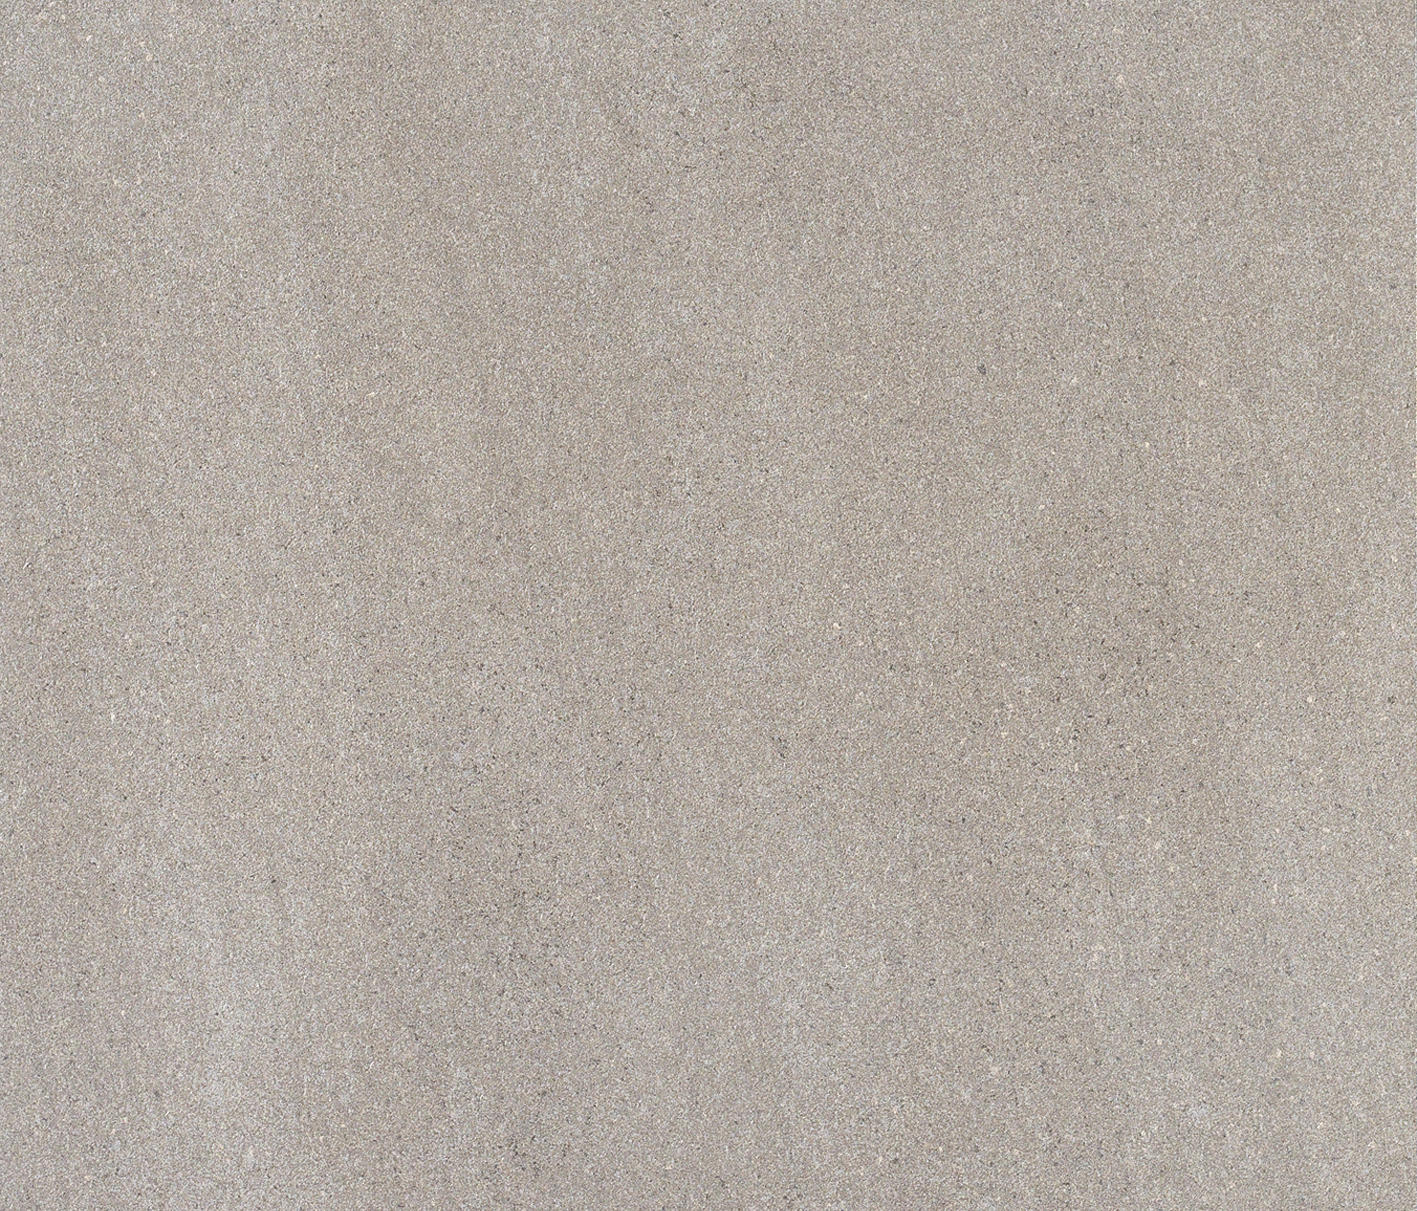 basaltina stone project sabbiata tiles from lea. Black Bedroom Furniture Sets. Home Design Ideas